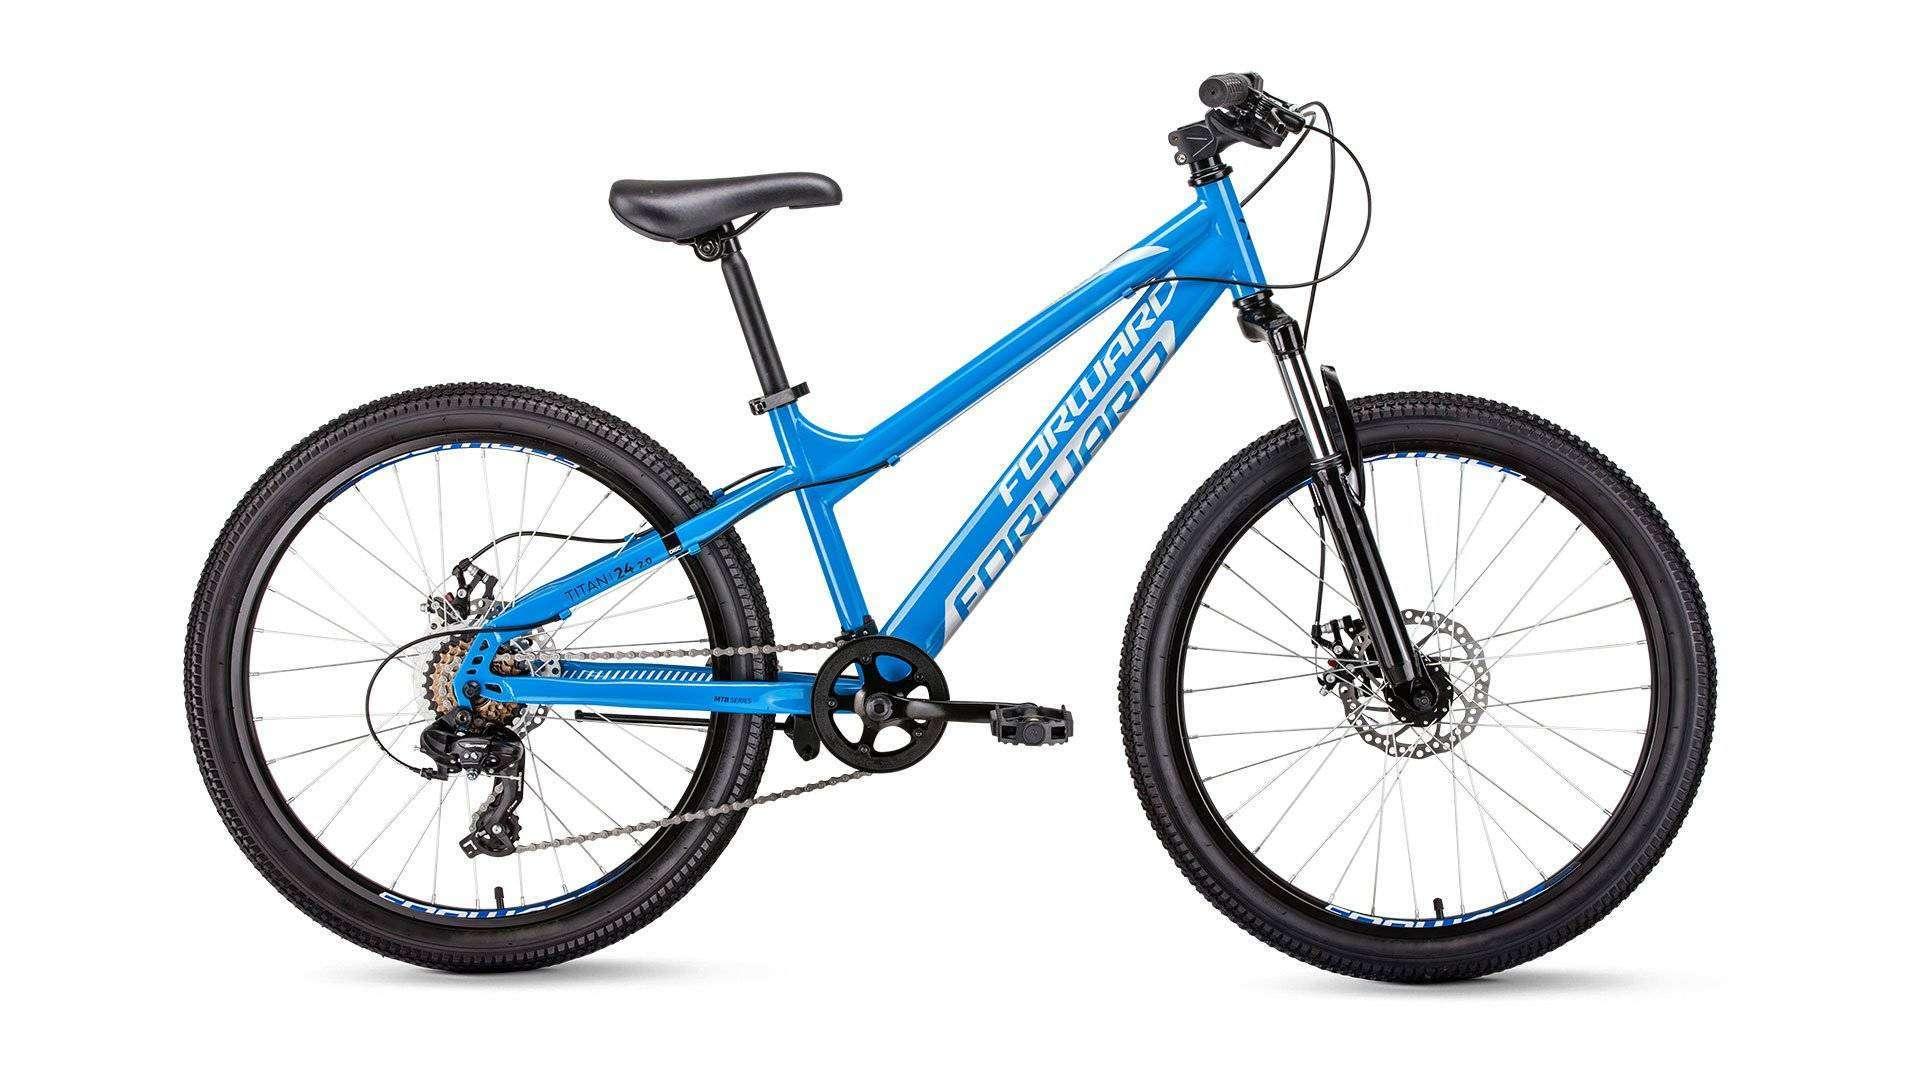 Велосипед FORWARD TITAN 24 2.0 disc 2018-2019 41705